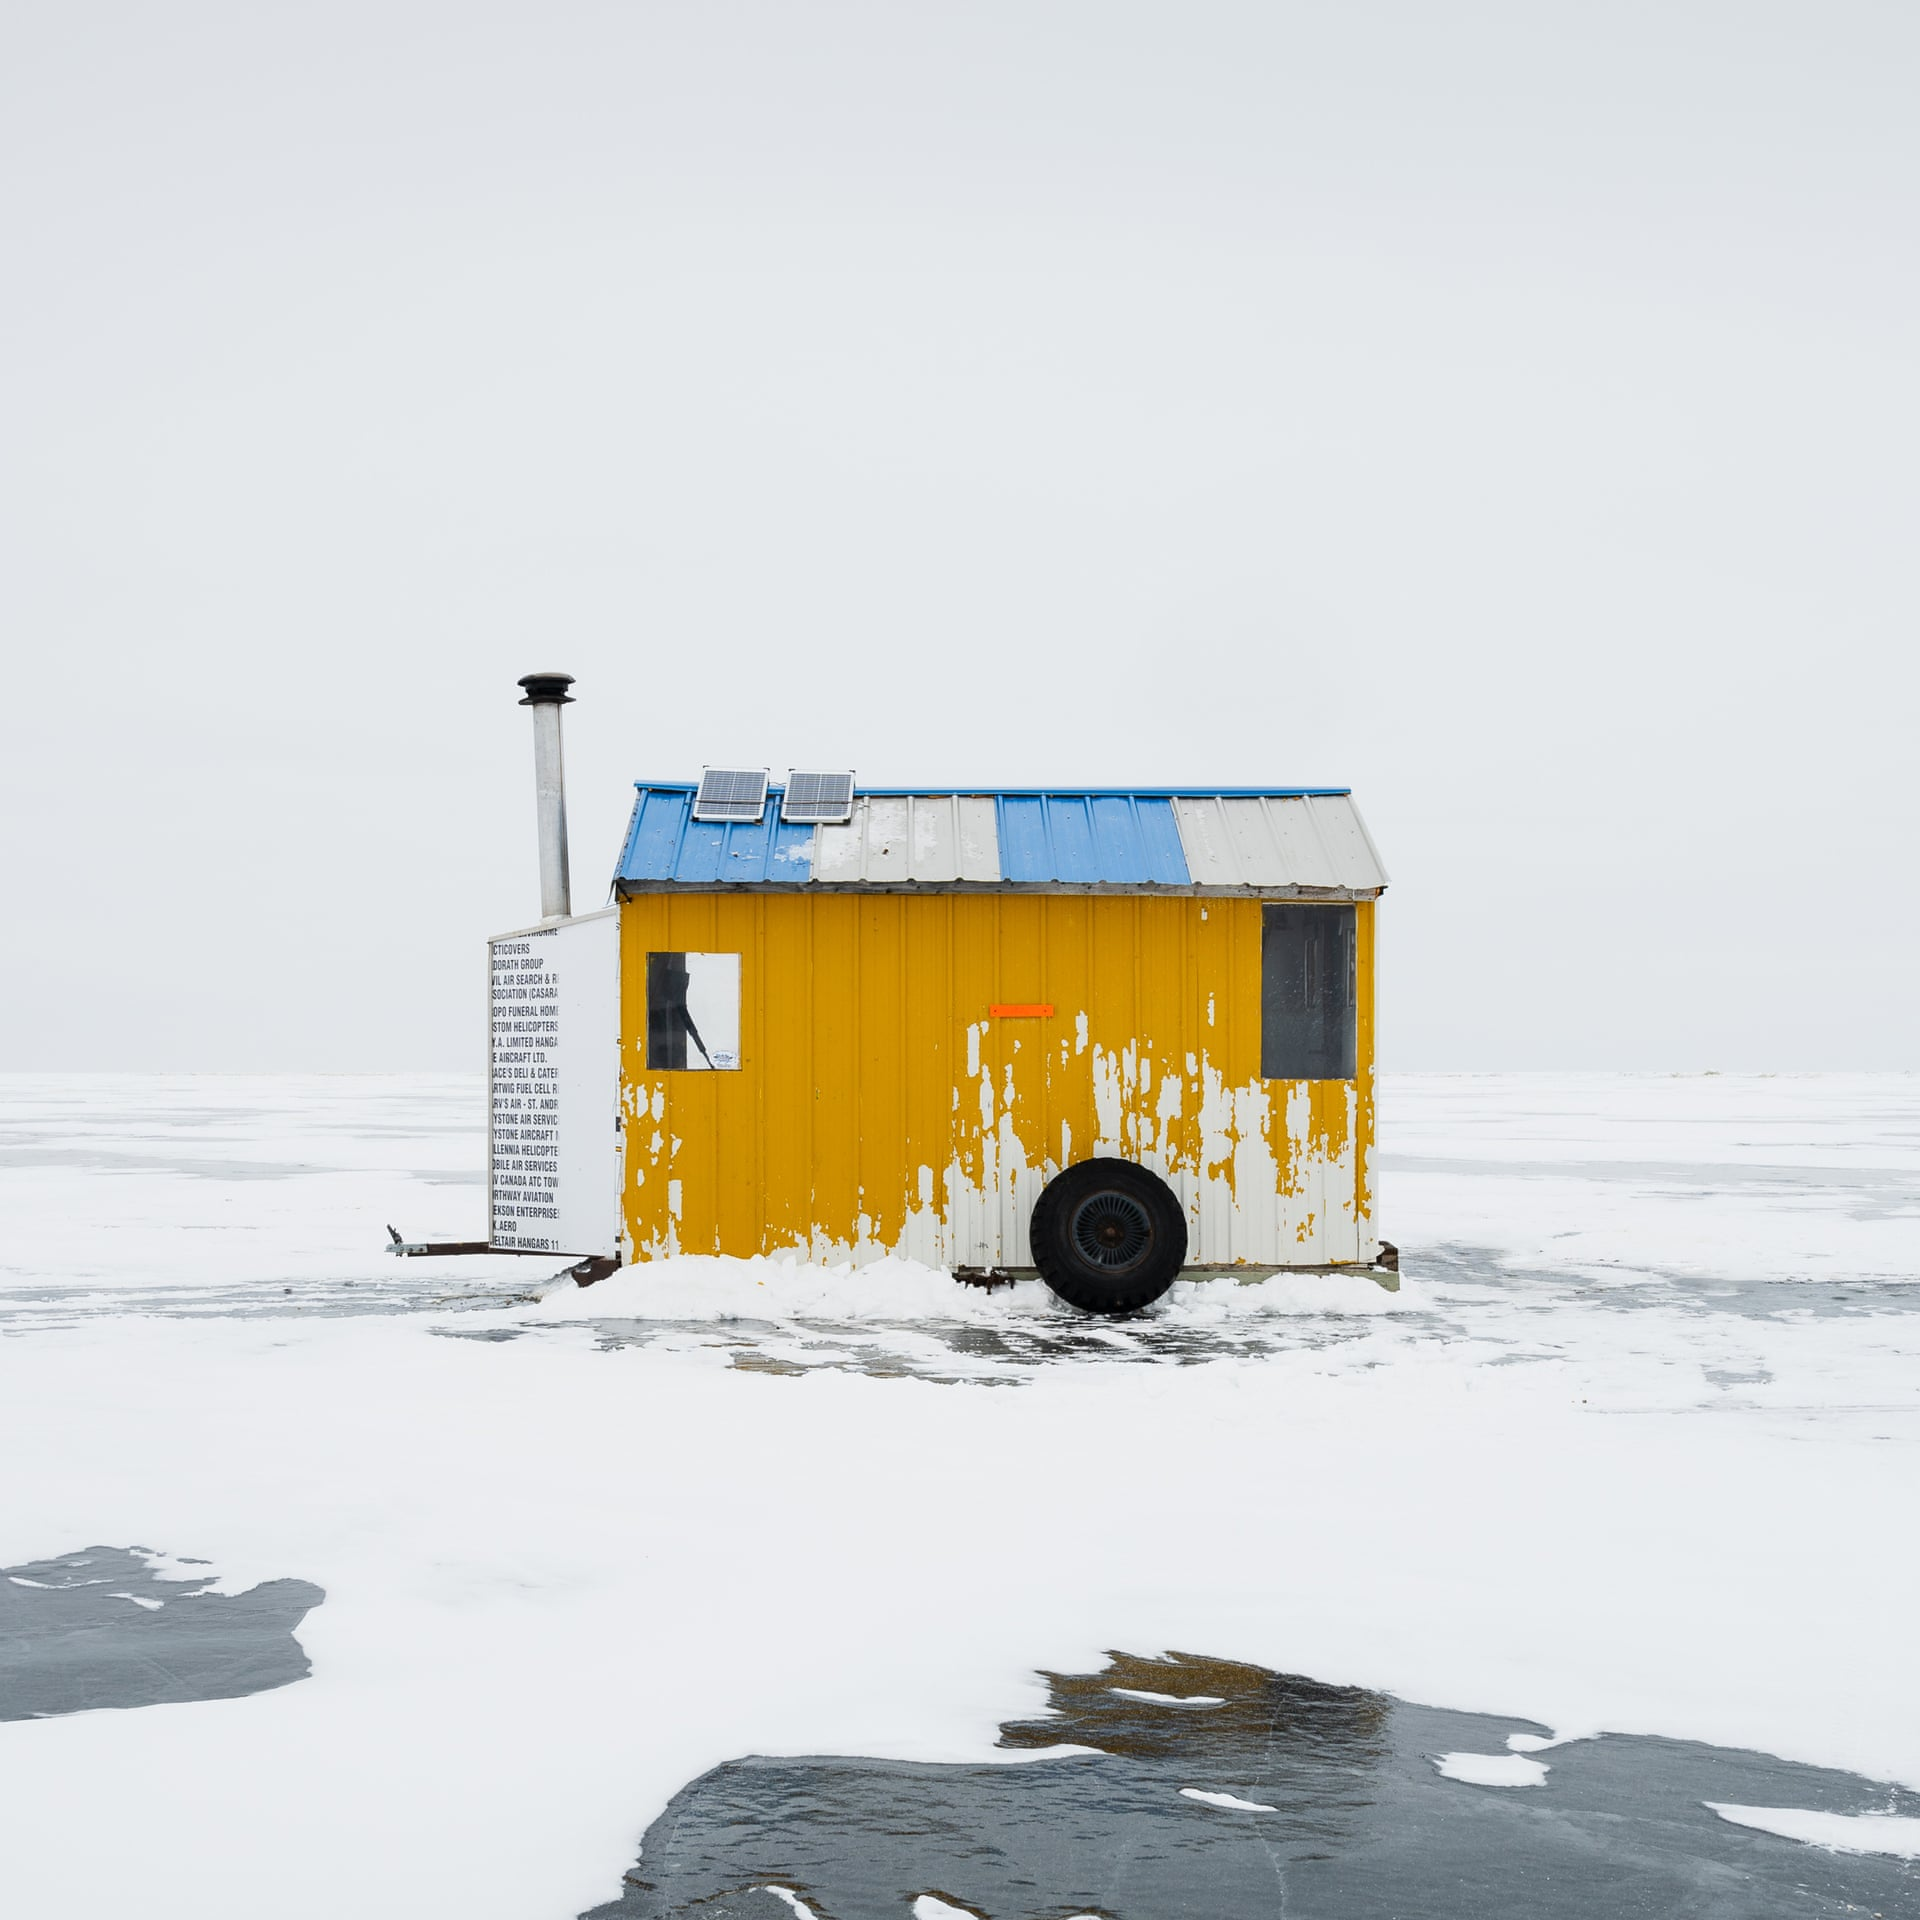 Категория «Архитектура» (Architectire), победитель — Сандра Гербер / Sandra Herber (Канада) сциклом «Подледная рыбалка наозере Виннипег» / Ice Fishing Huts, Lake Winnipeg